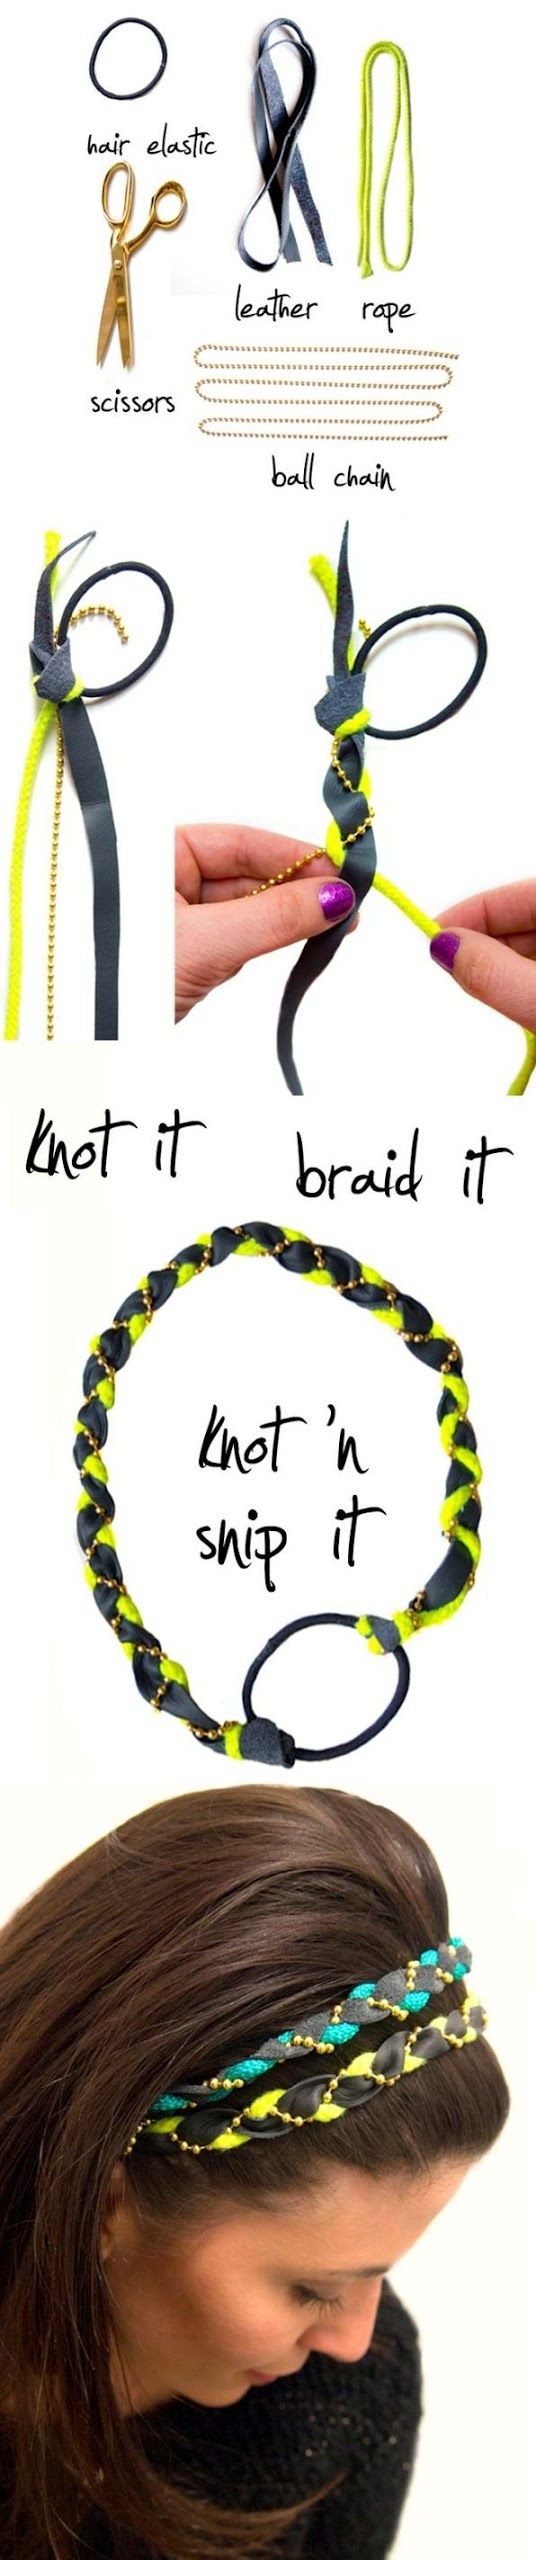 DIY: Quick & Easy Braided Headband. I need to make this!